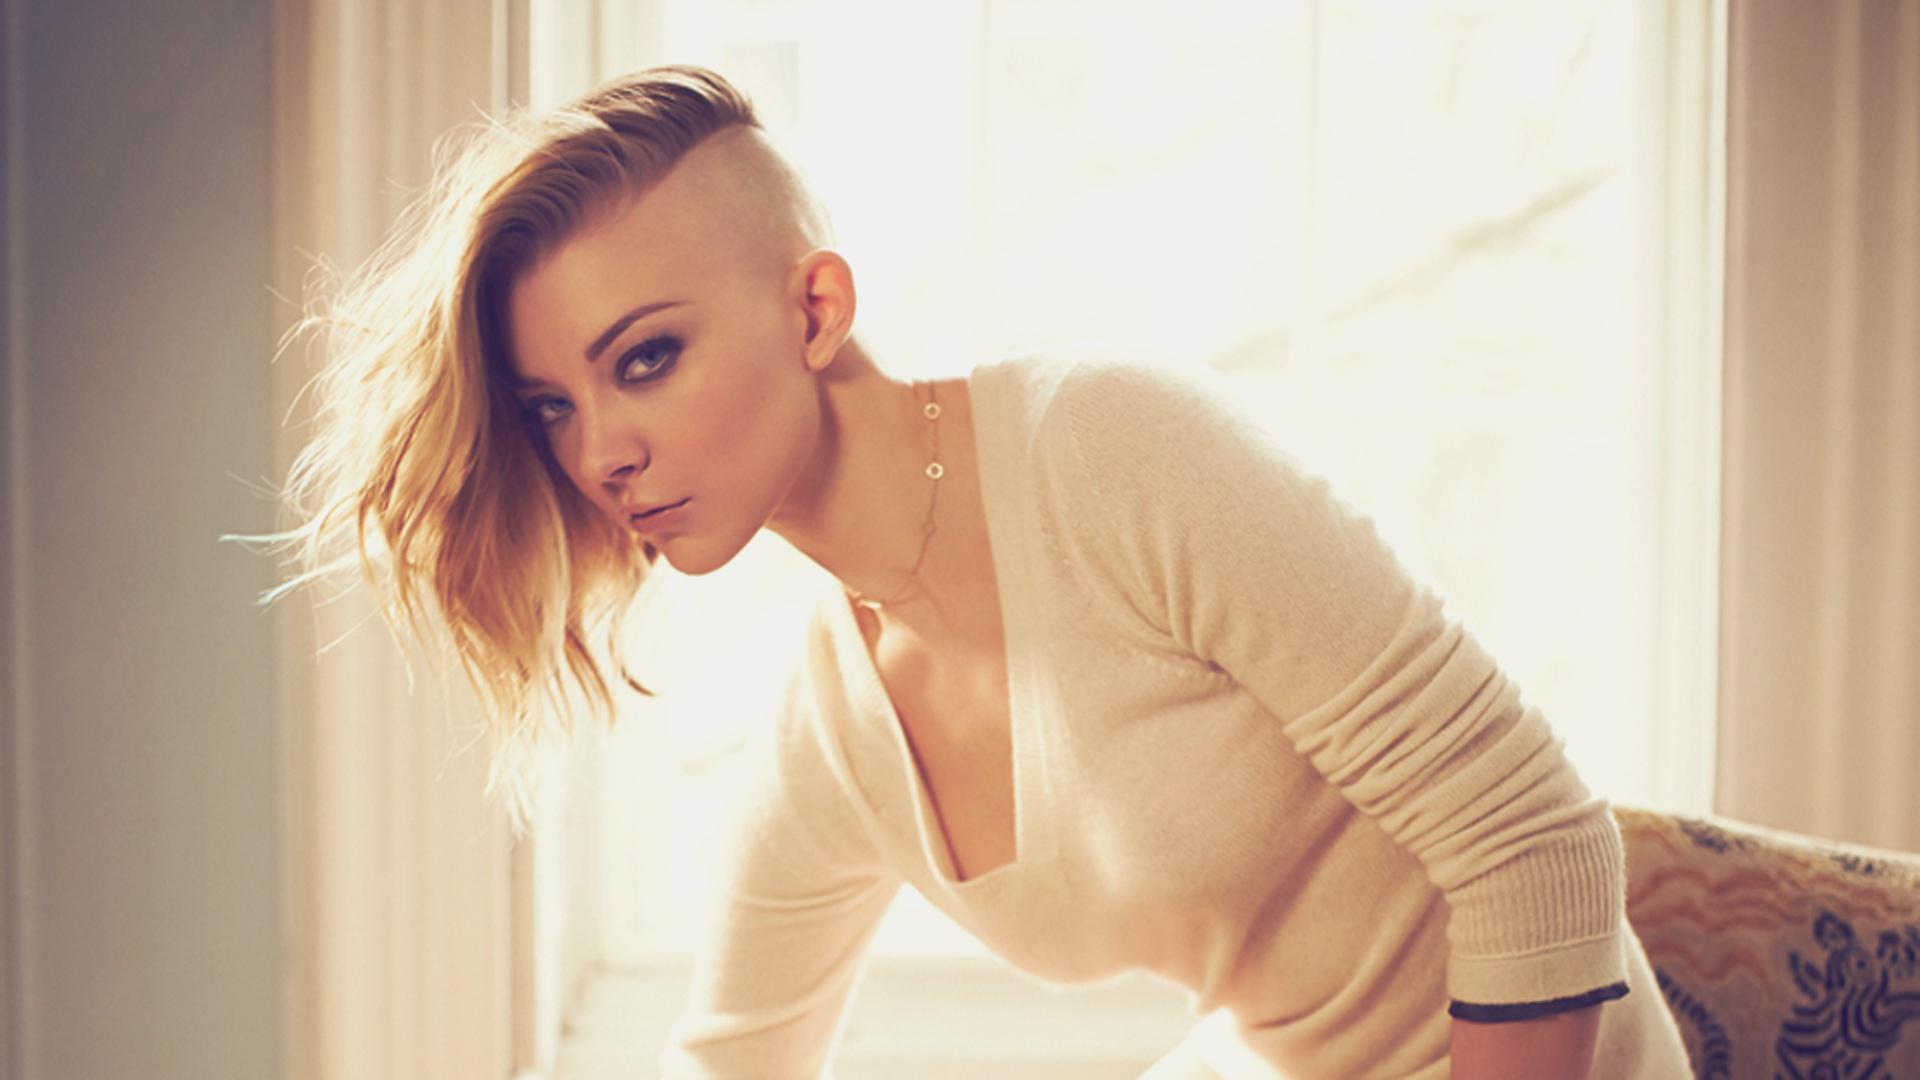 hot-girl-shave-virgin-deepthroat-pics